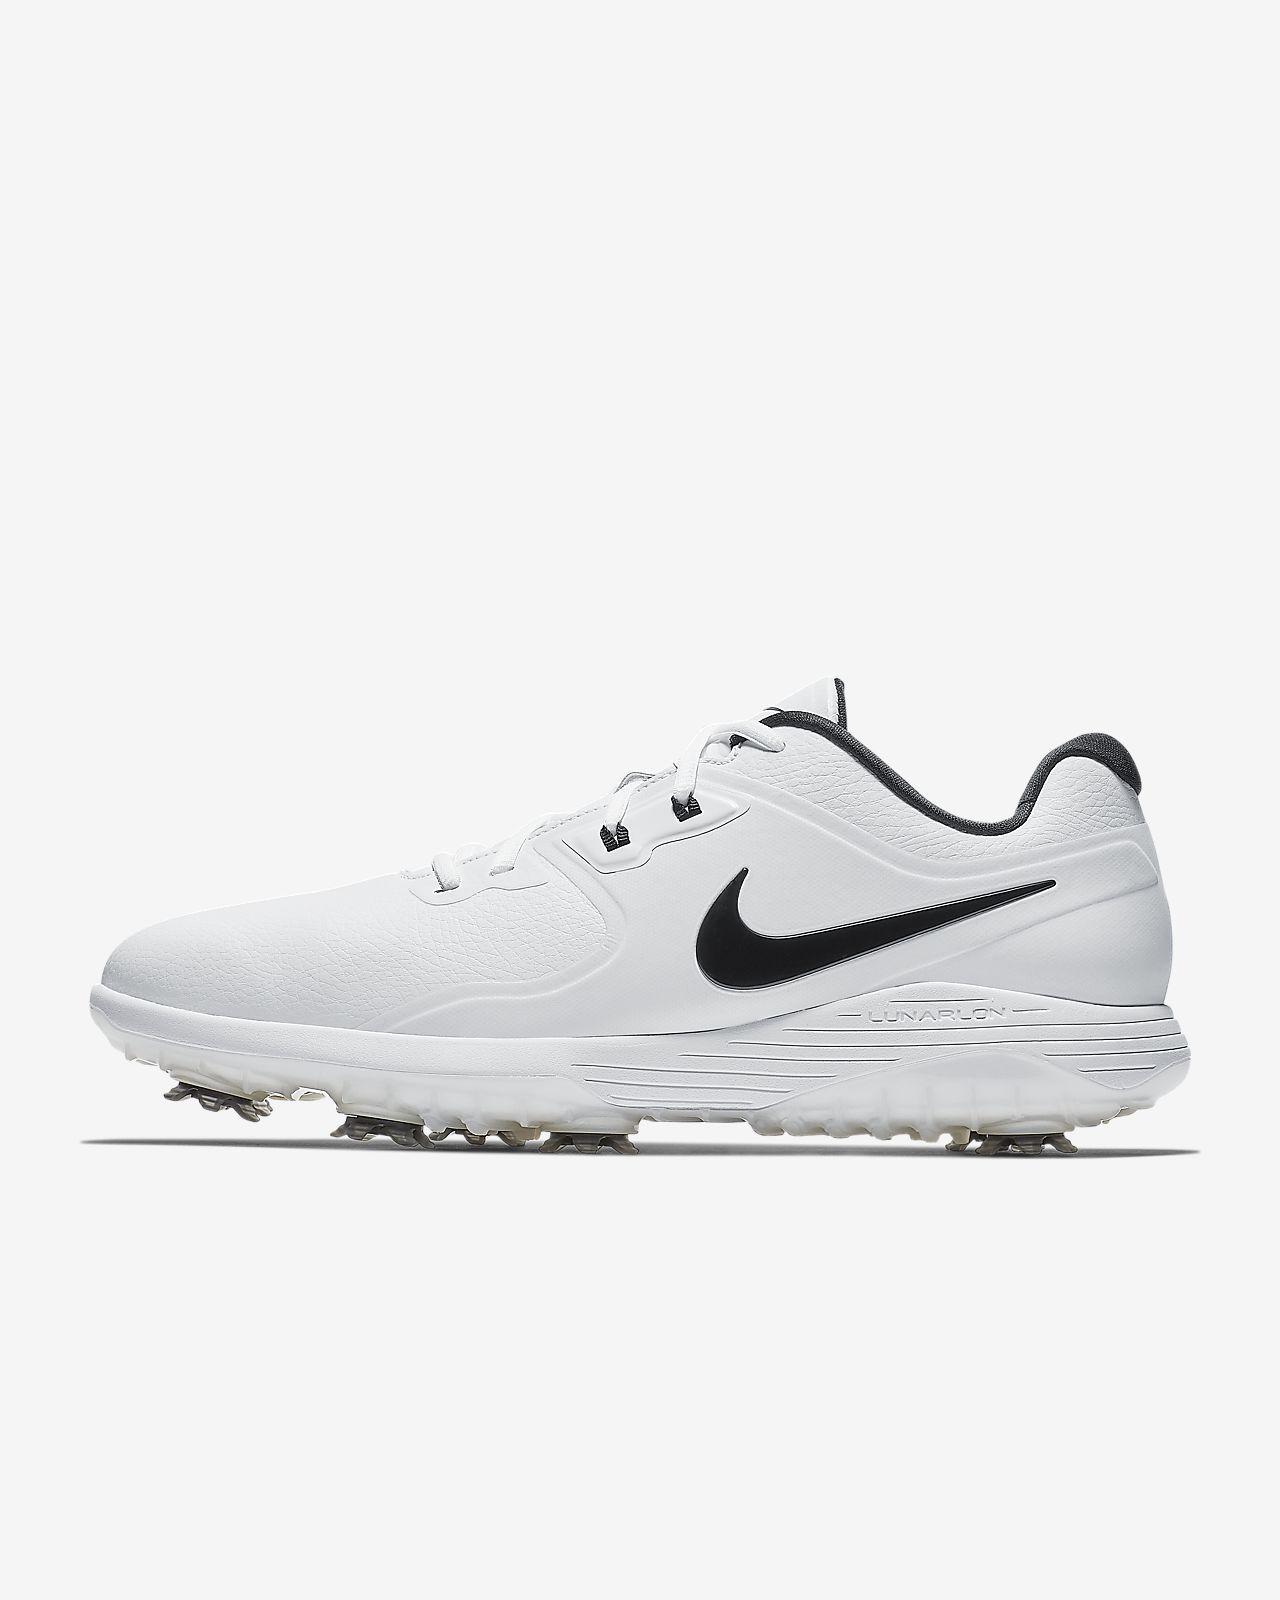 Nike Vapor Pro Herren-Golfschuh